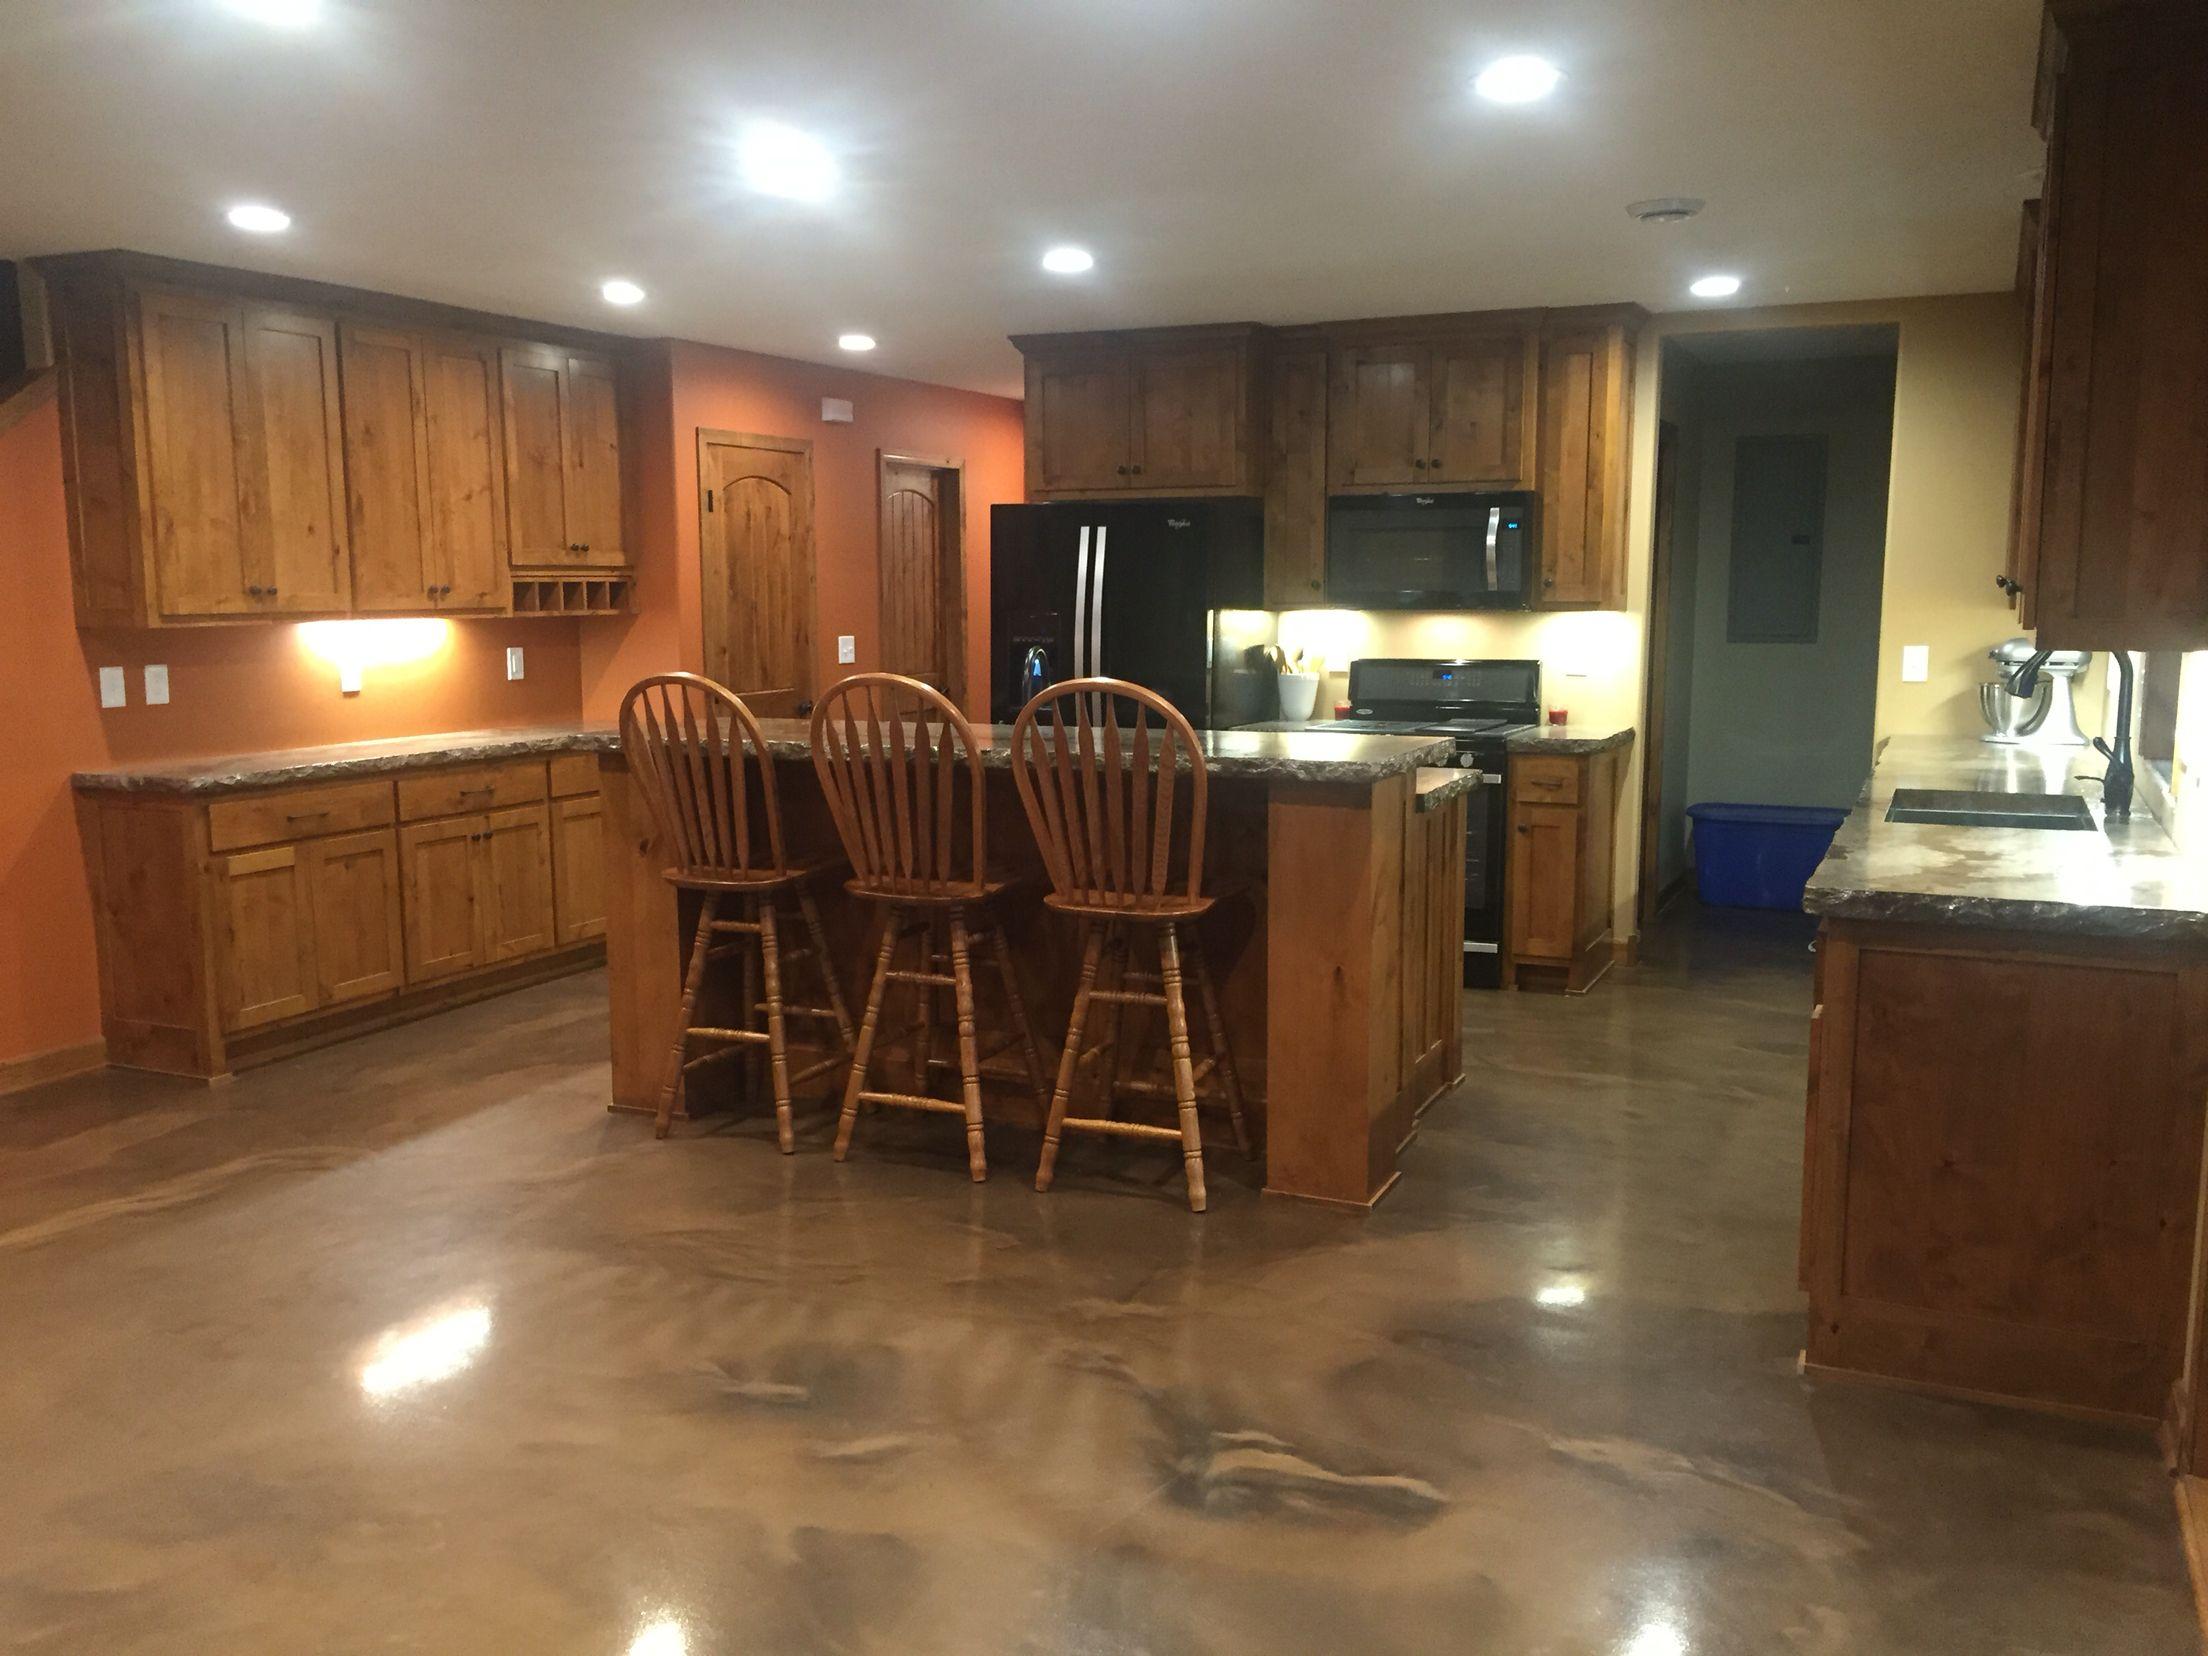 Metallic Epoxy Floor Coating For A Slab On Grade Home By Sierra Concrete Arts Epoxy Floor Metallic Epoxy Floor Floor Coating